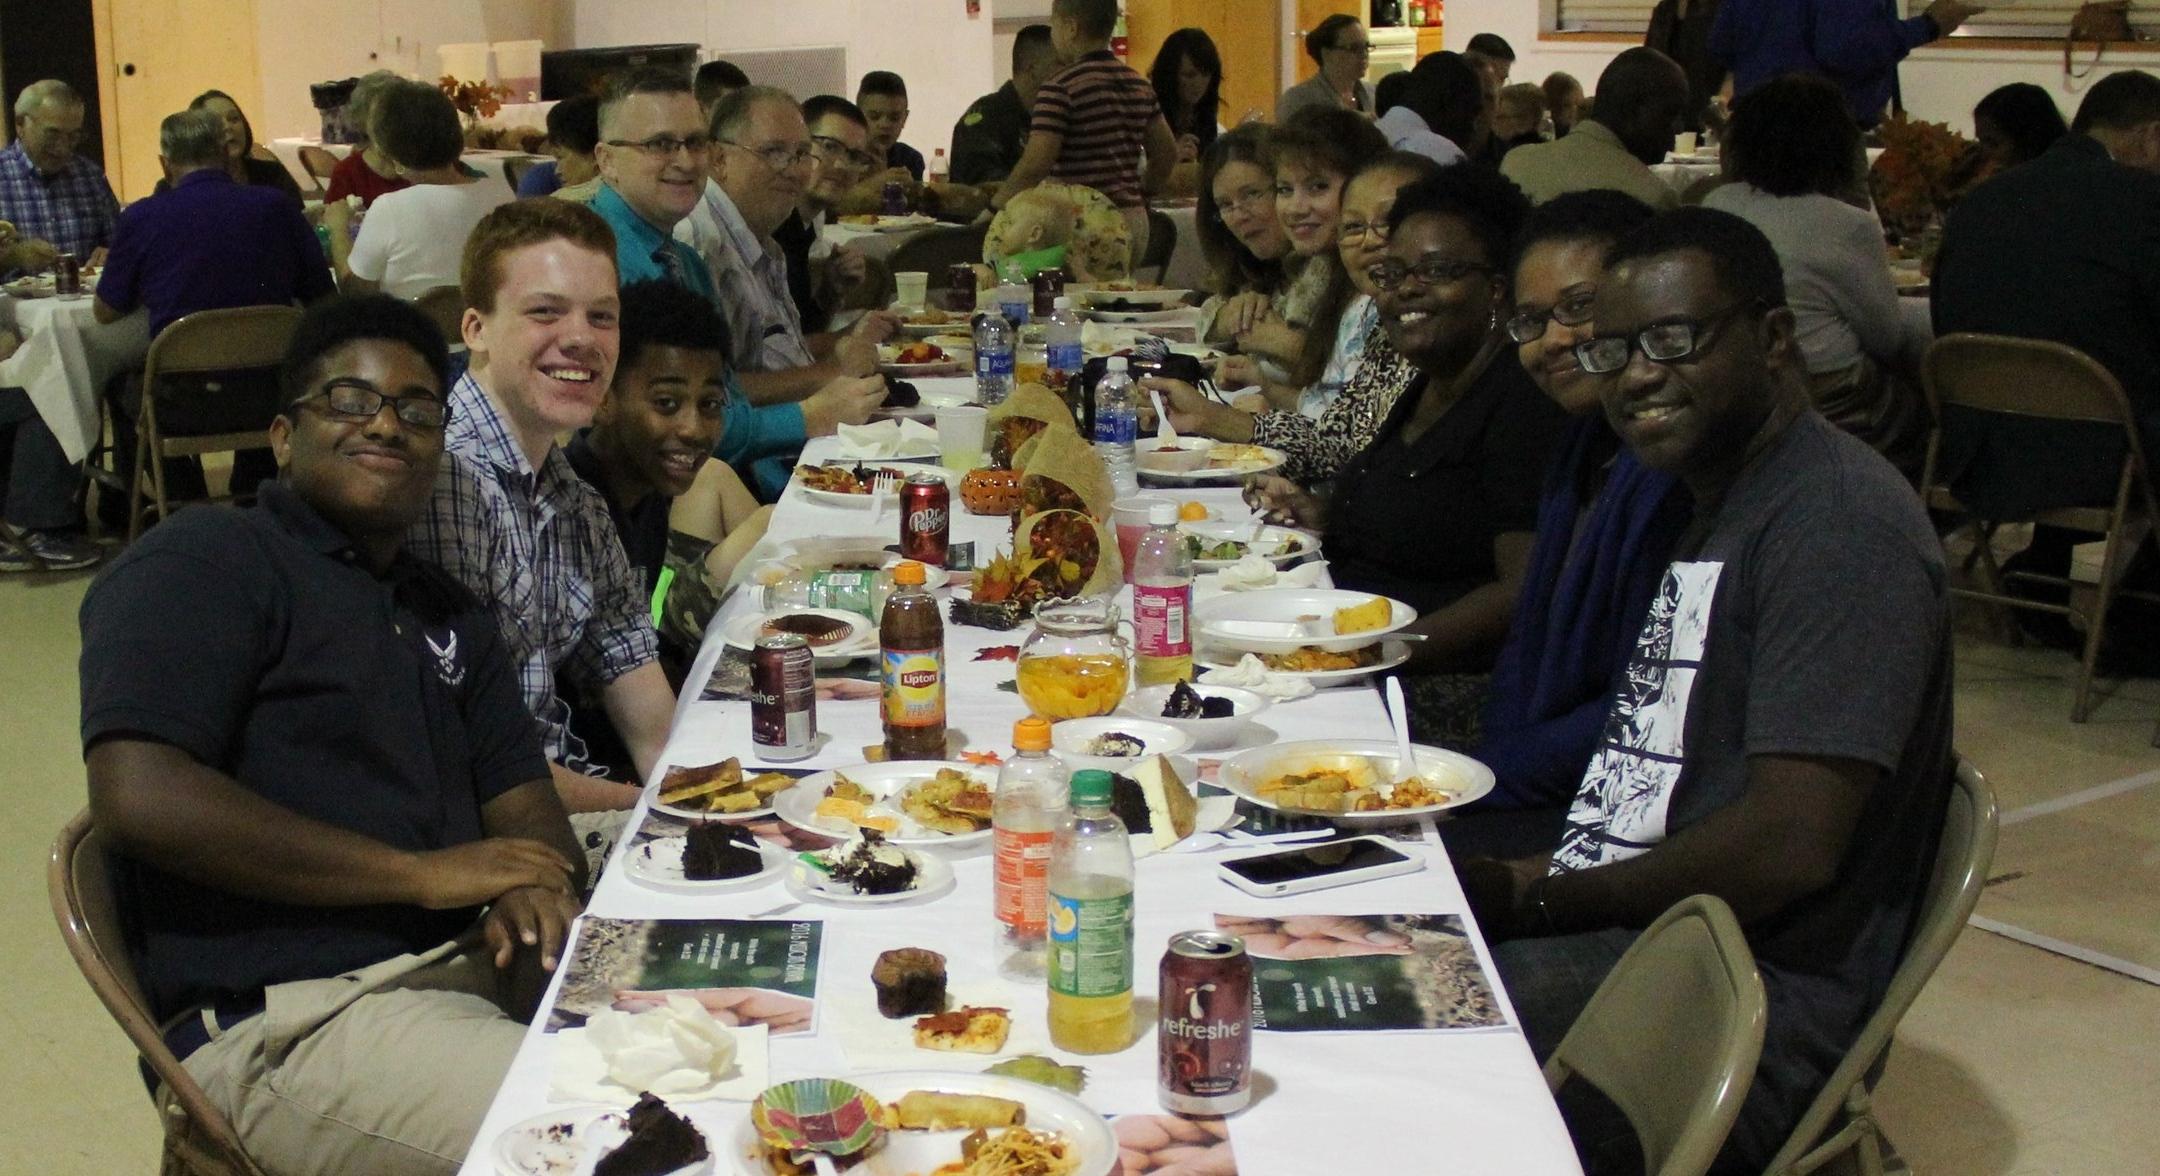 Enjoying dinner at the church..JPG